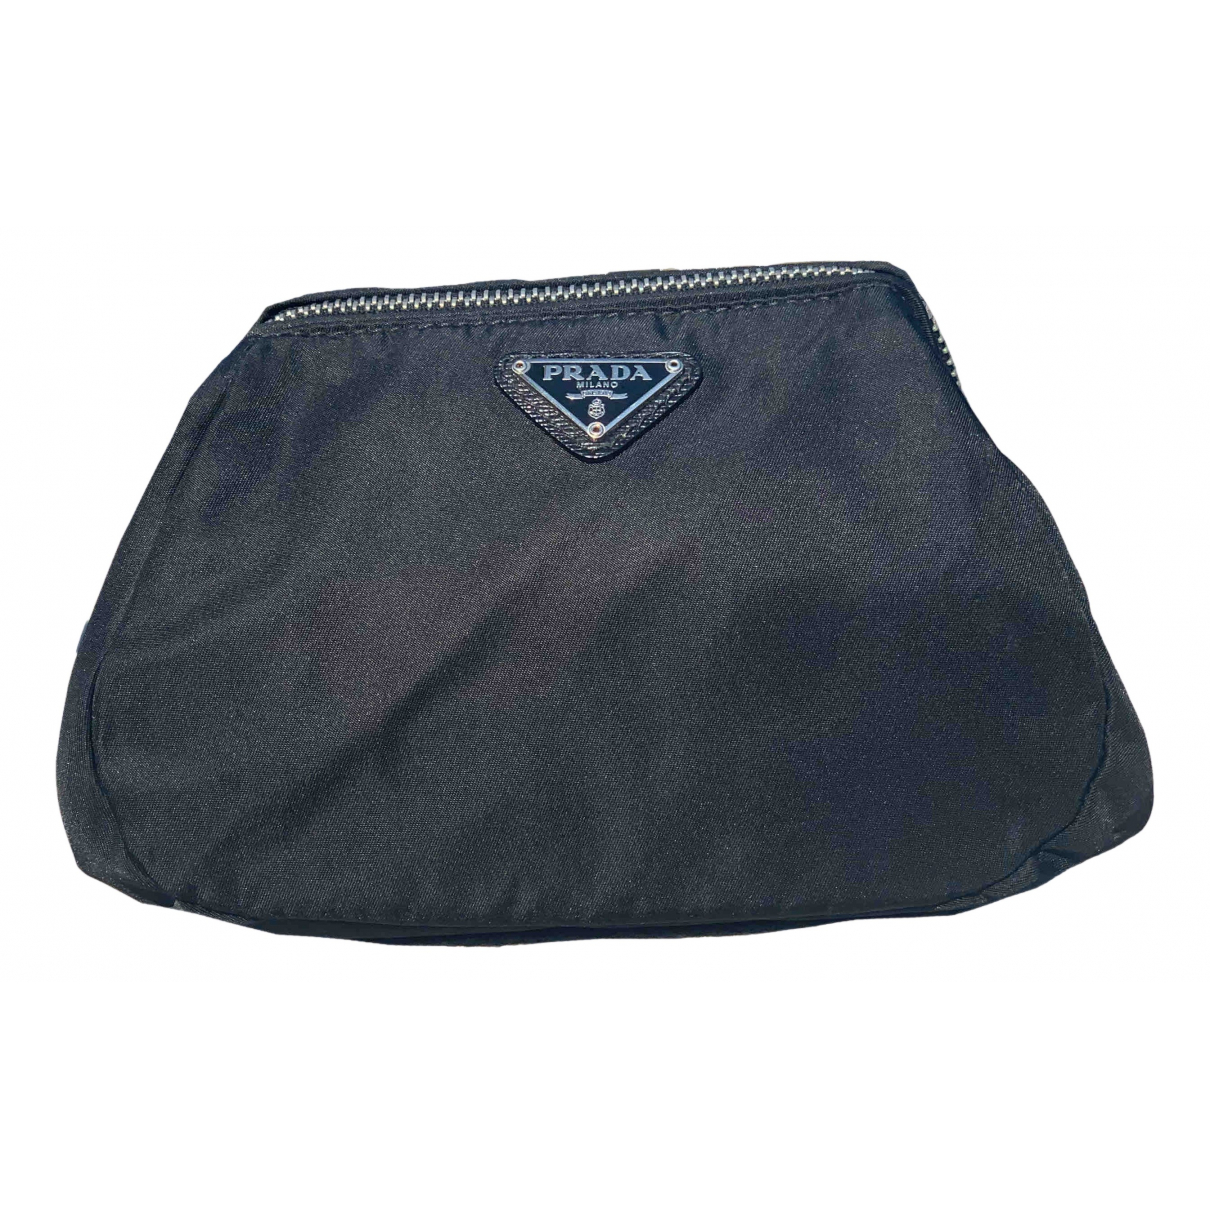 Prada Tessuto  Black Cloth Clutch bag for Women N